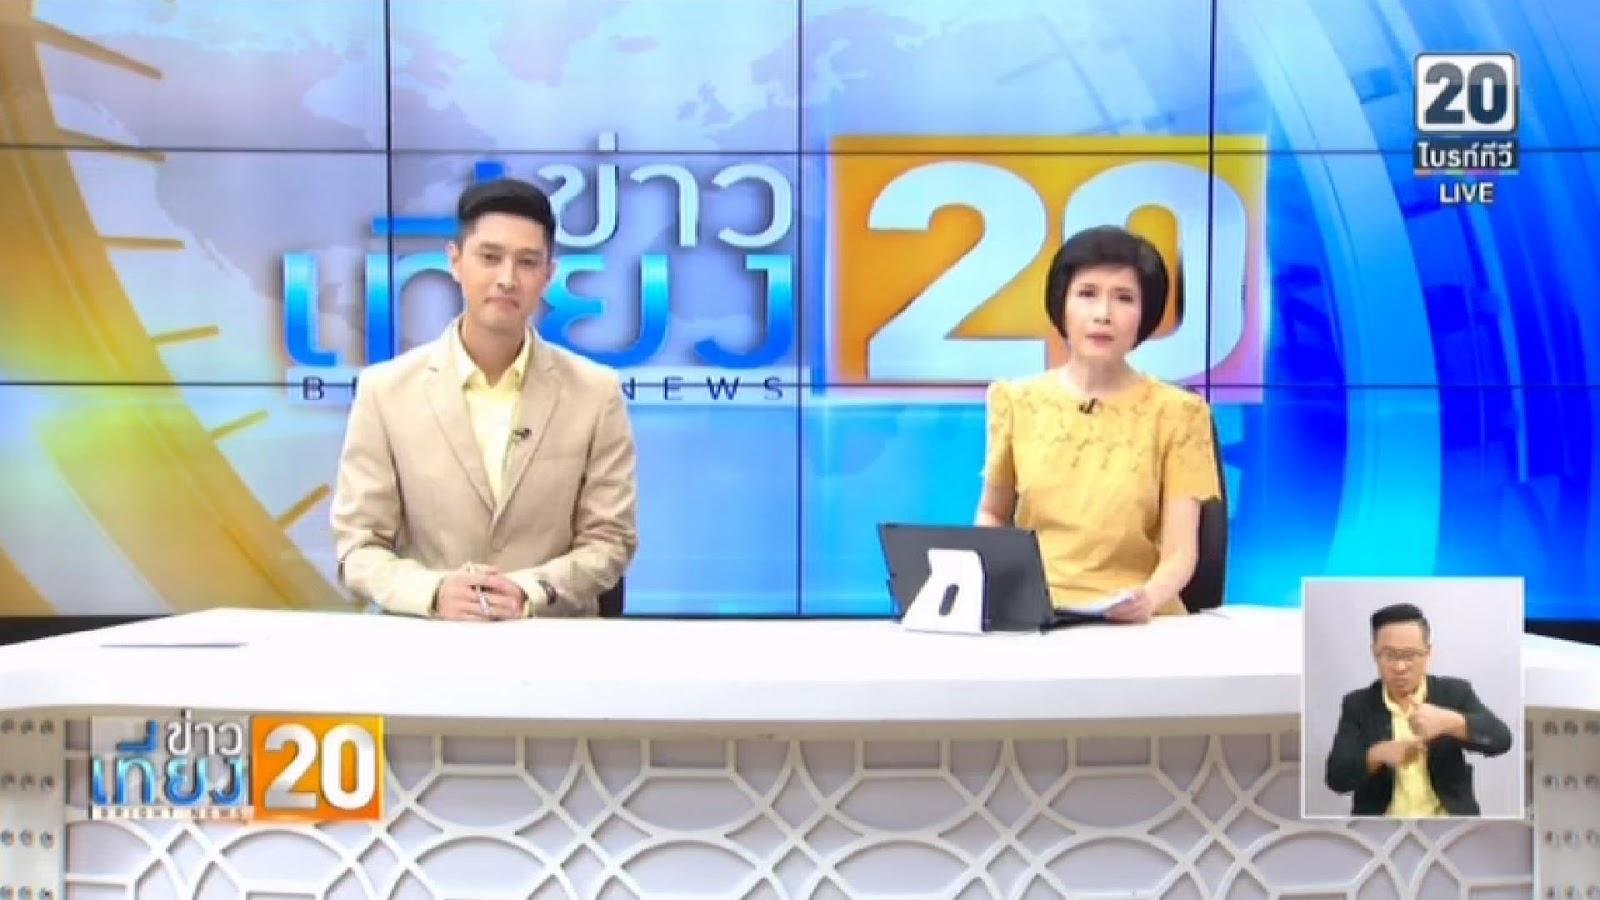 Frekuensi siaran Bright TV Thailand di satelit Thaicom 6 Terbaru